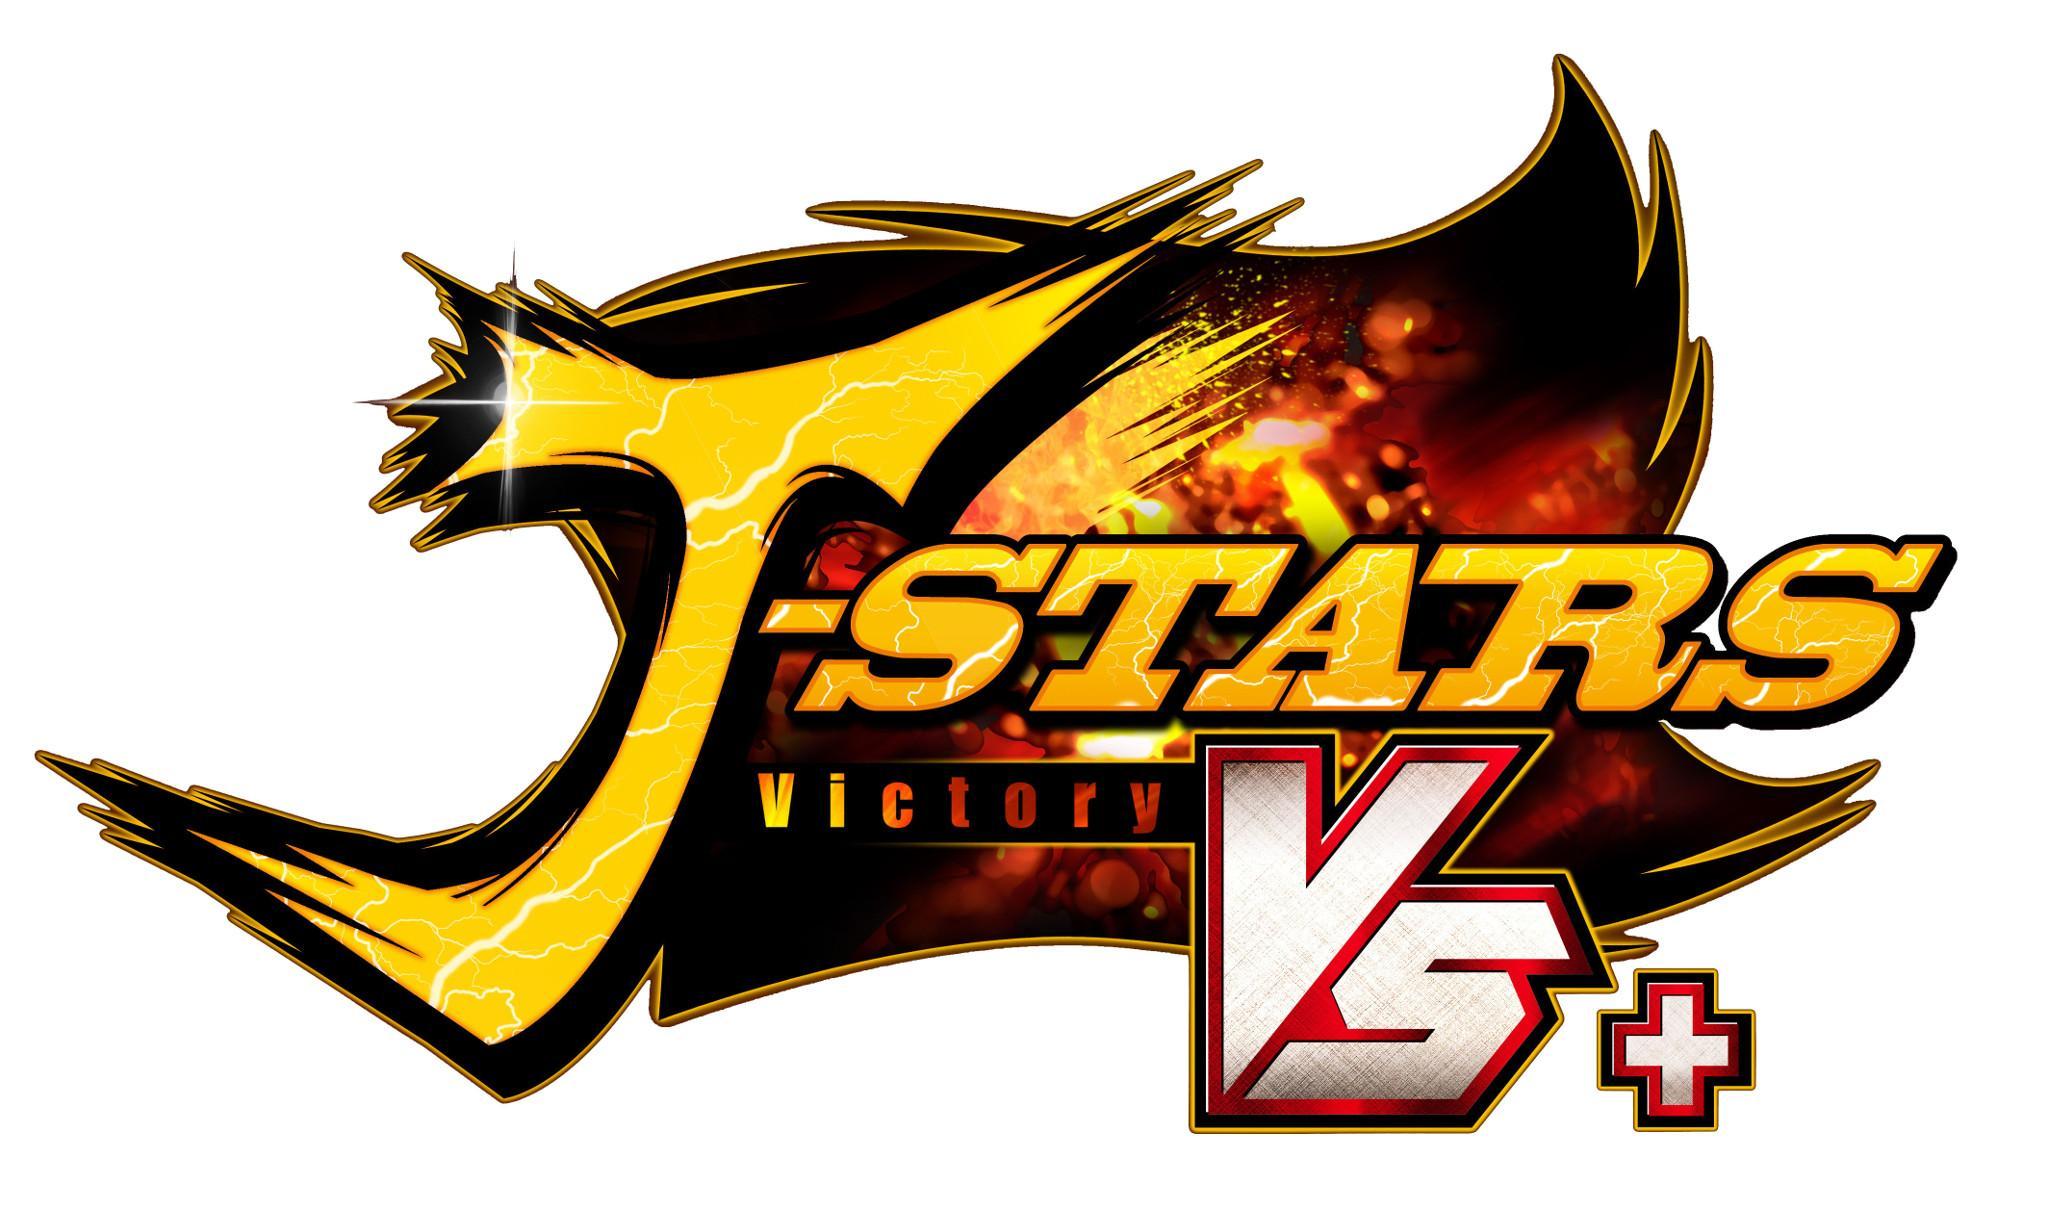 J-STARS-Victory-VS_logo_US-culturageek.com.ar